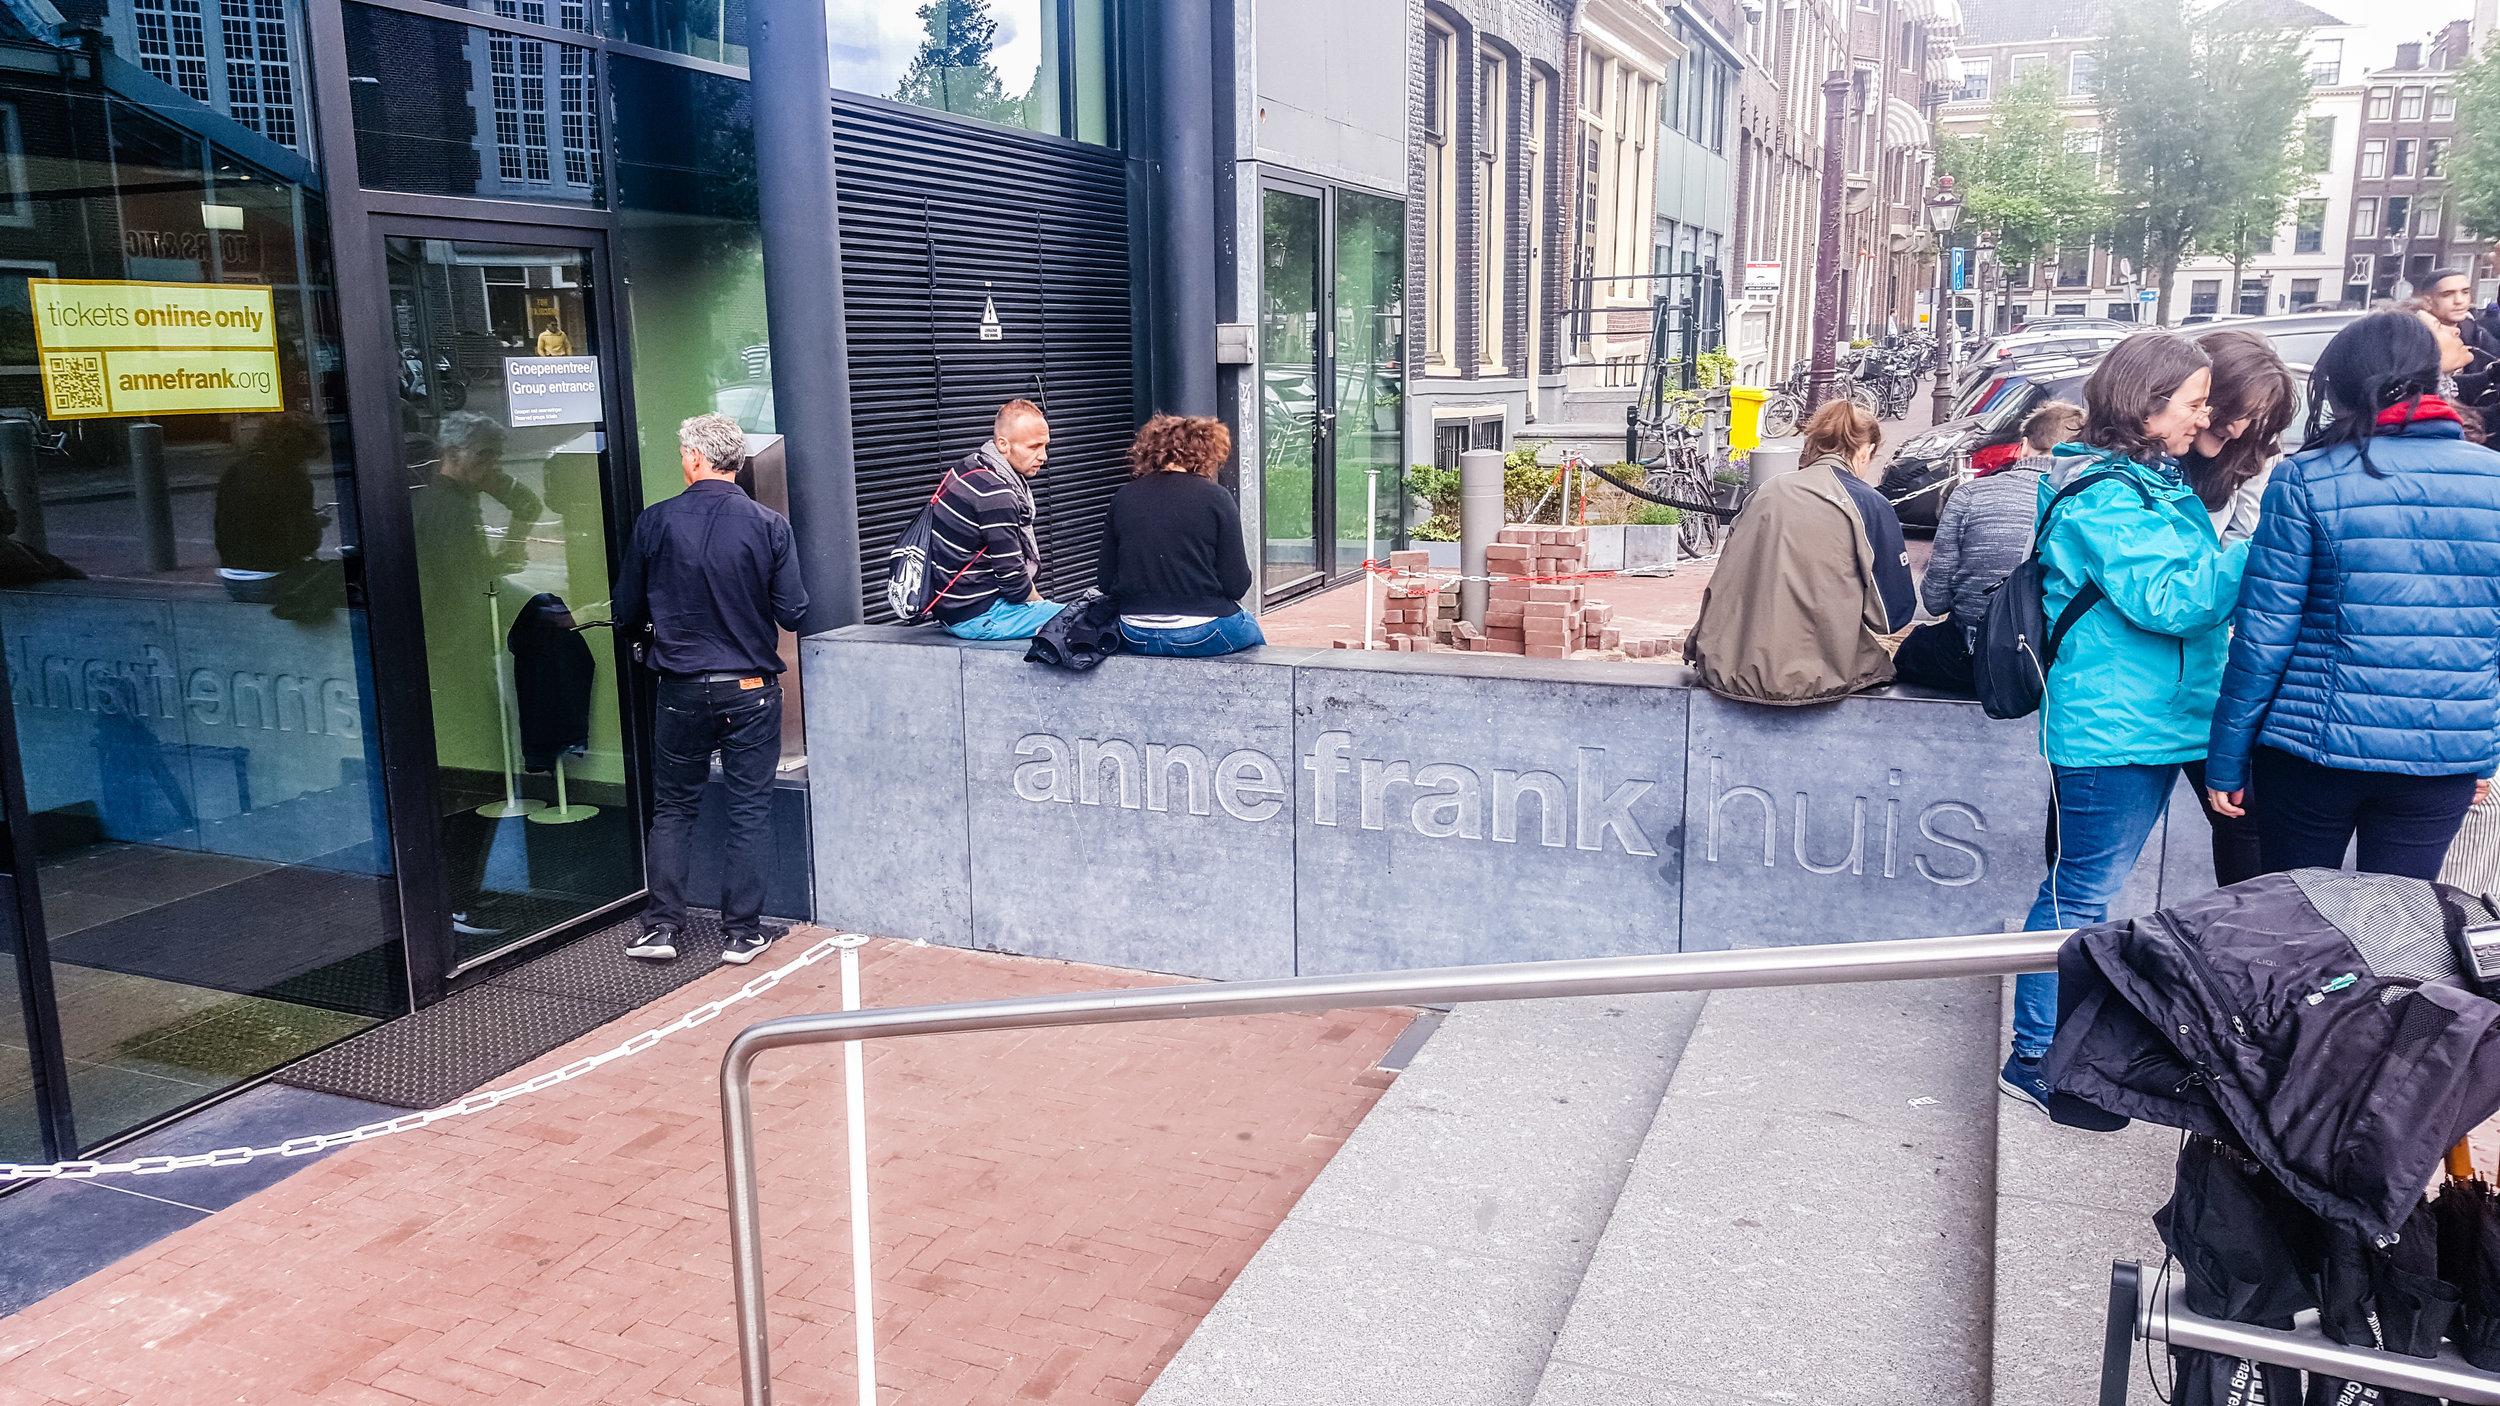 amsterdam4blog-8.jpg